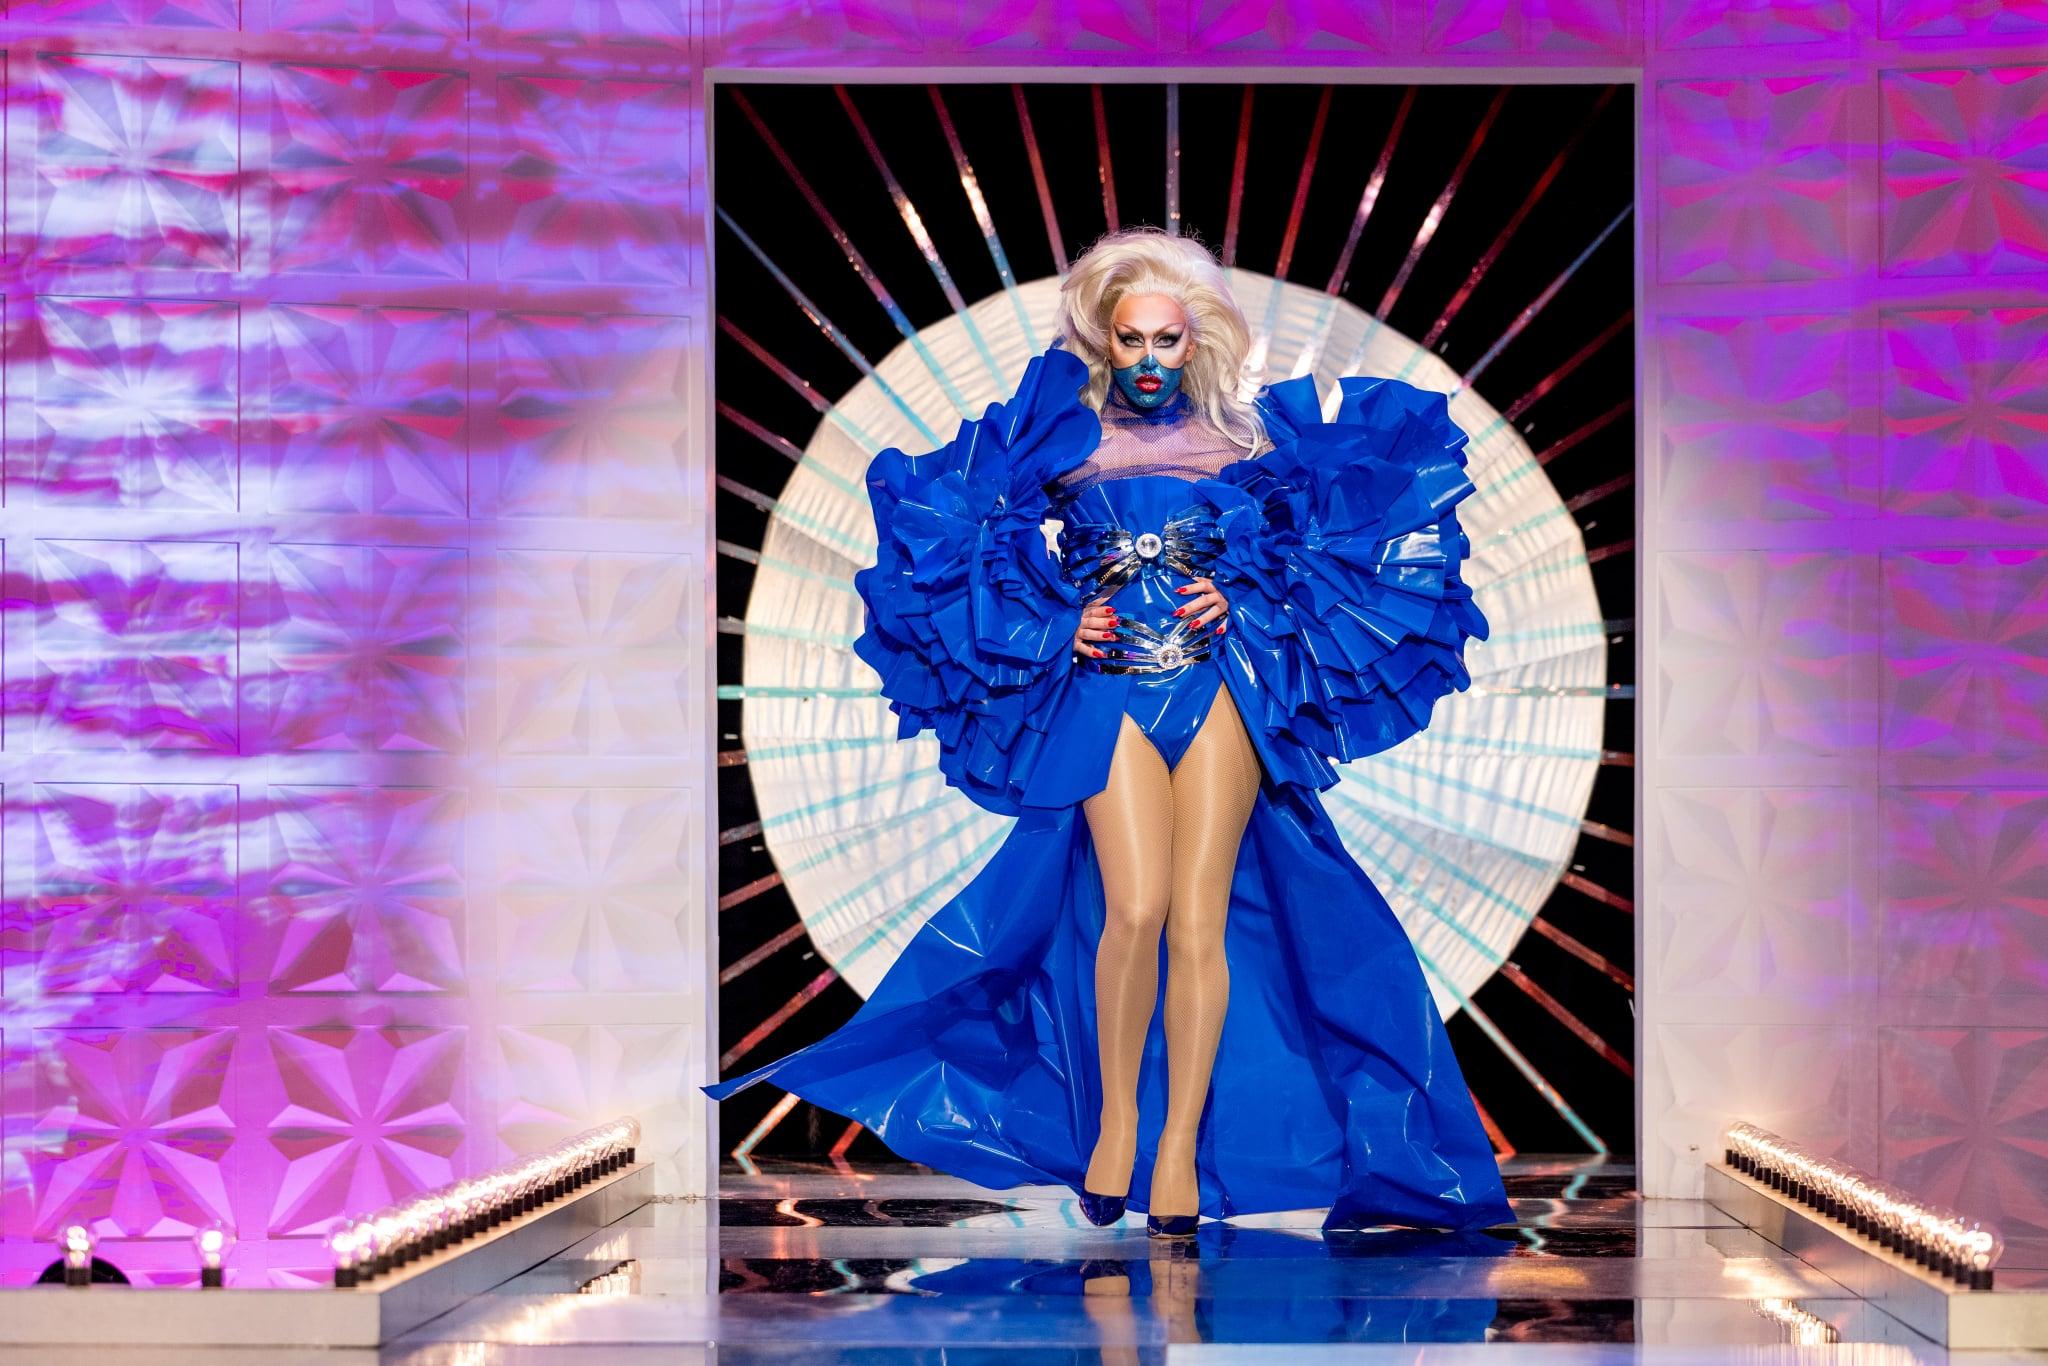 نام برنامه: RuPaul's Drag Race UK سریال 2 - TX: n / a - قسمت: RuPaul's Drag Race series UK 2 قسمت 7 (شماره 7) - نمایش های عکس: A'Whora - (C) World of Wonder - عکاس: گای لوی